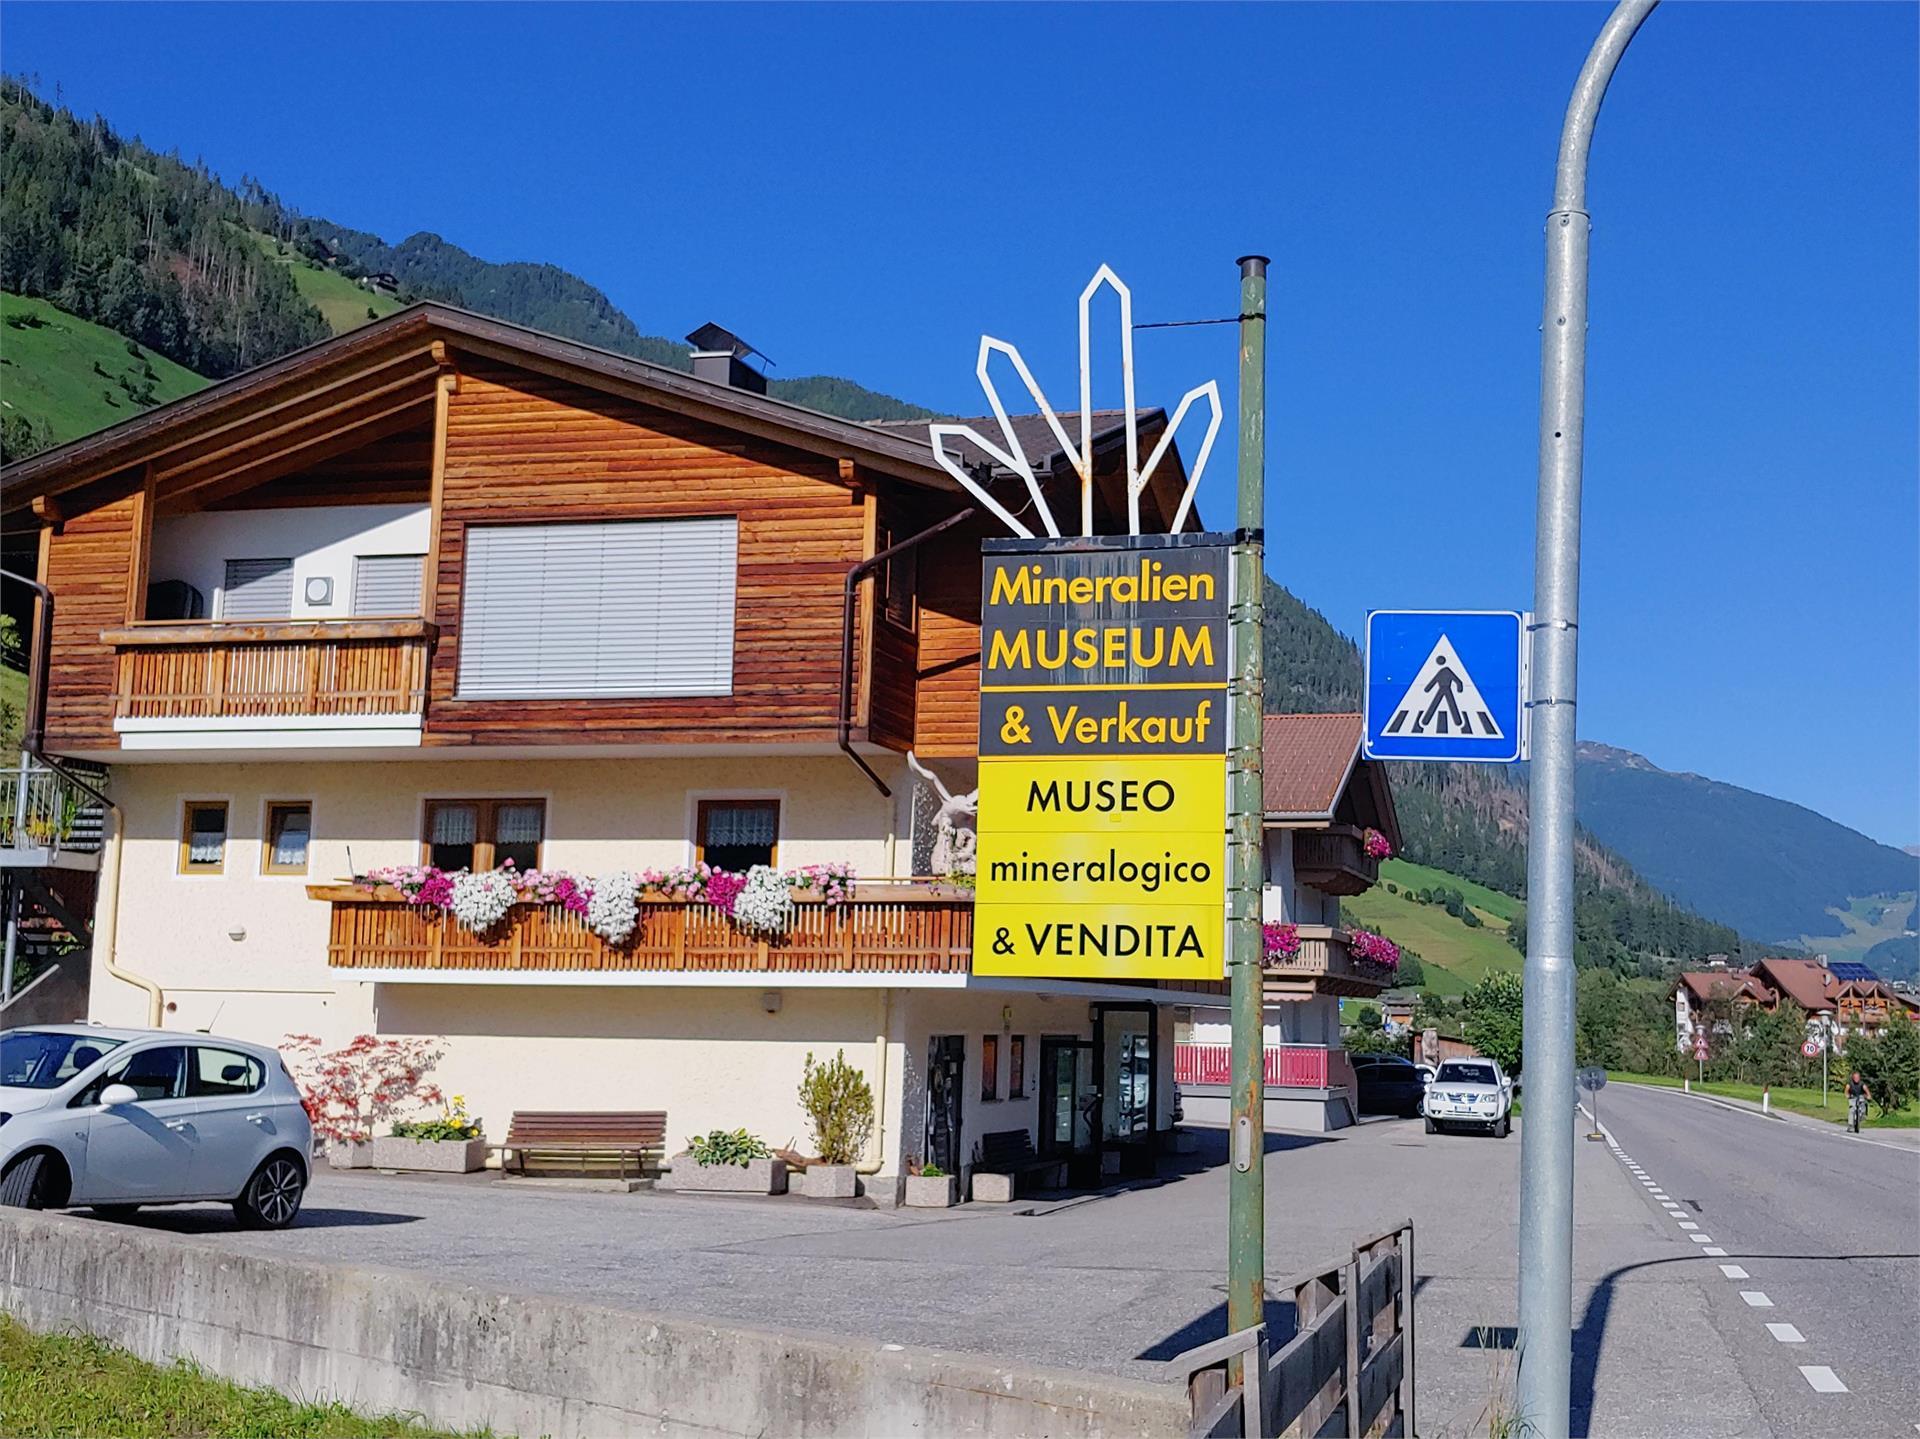 Museo mineralogico & shop